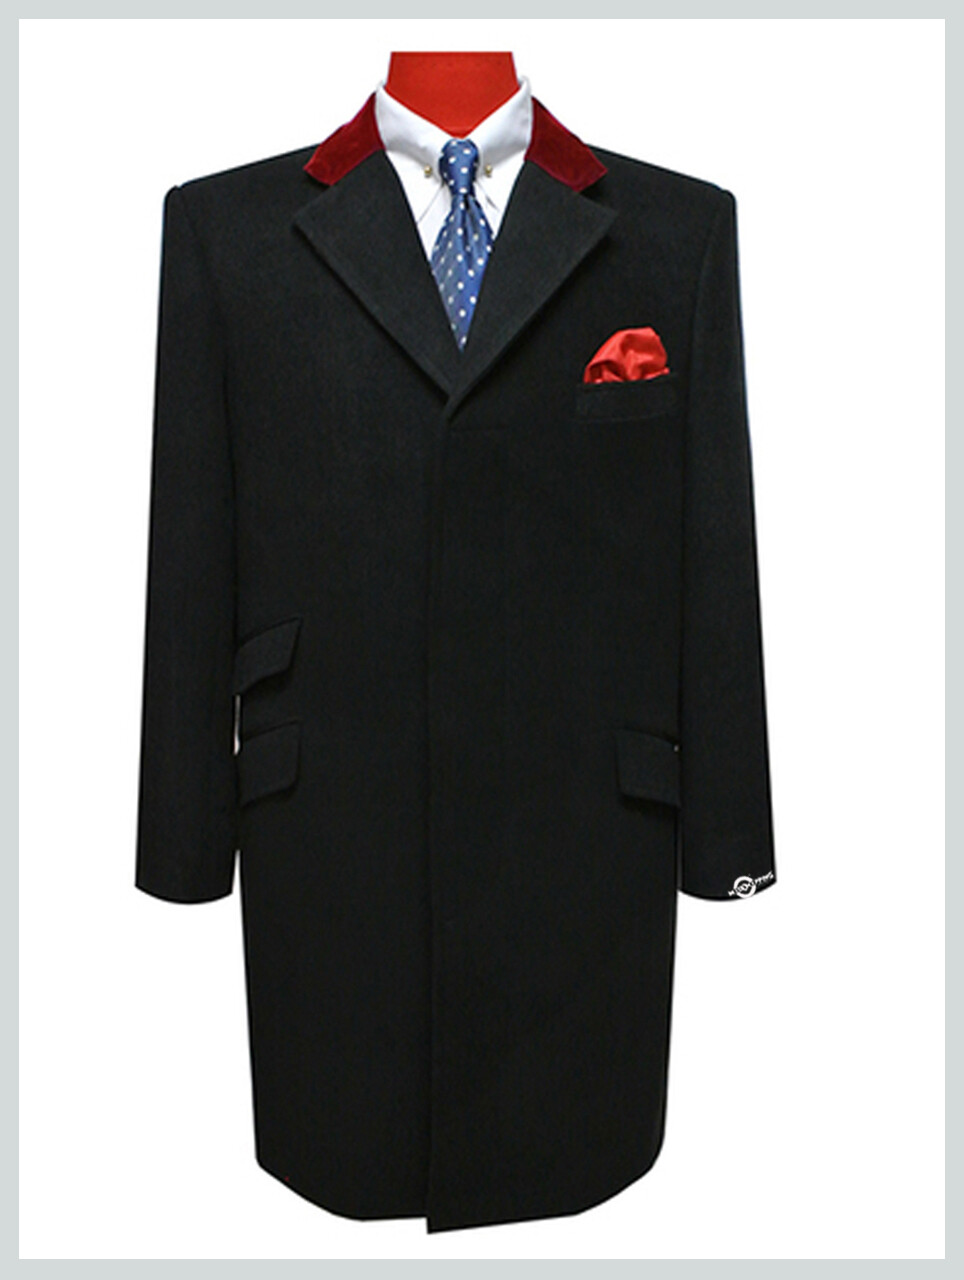 Overcoat| Original Vintage Style Maroon Velvet Black Men's Winter Coat